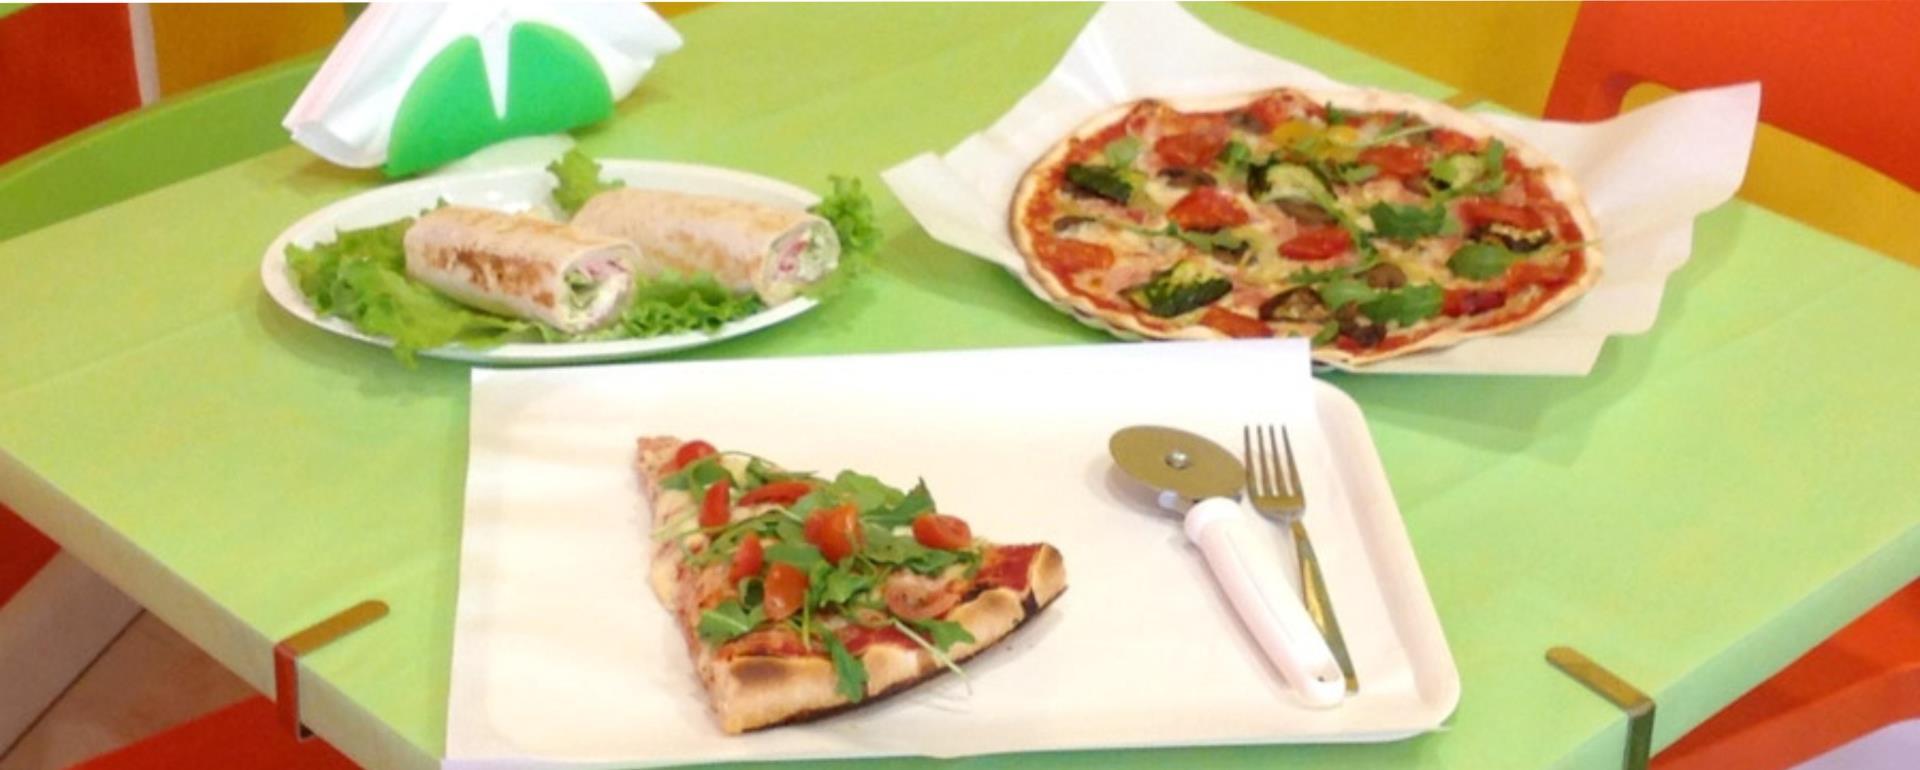 Pizza Traversetolo Parma; piadine Traversetolo Parma; piadipizza Parma